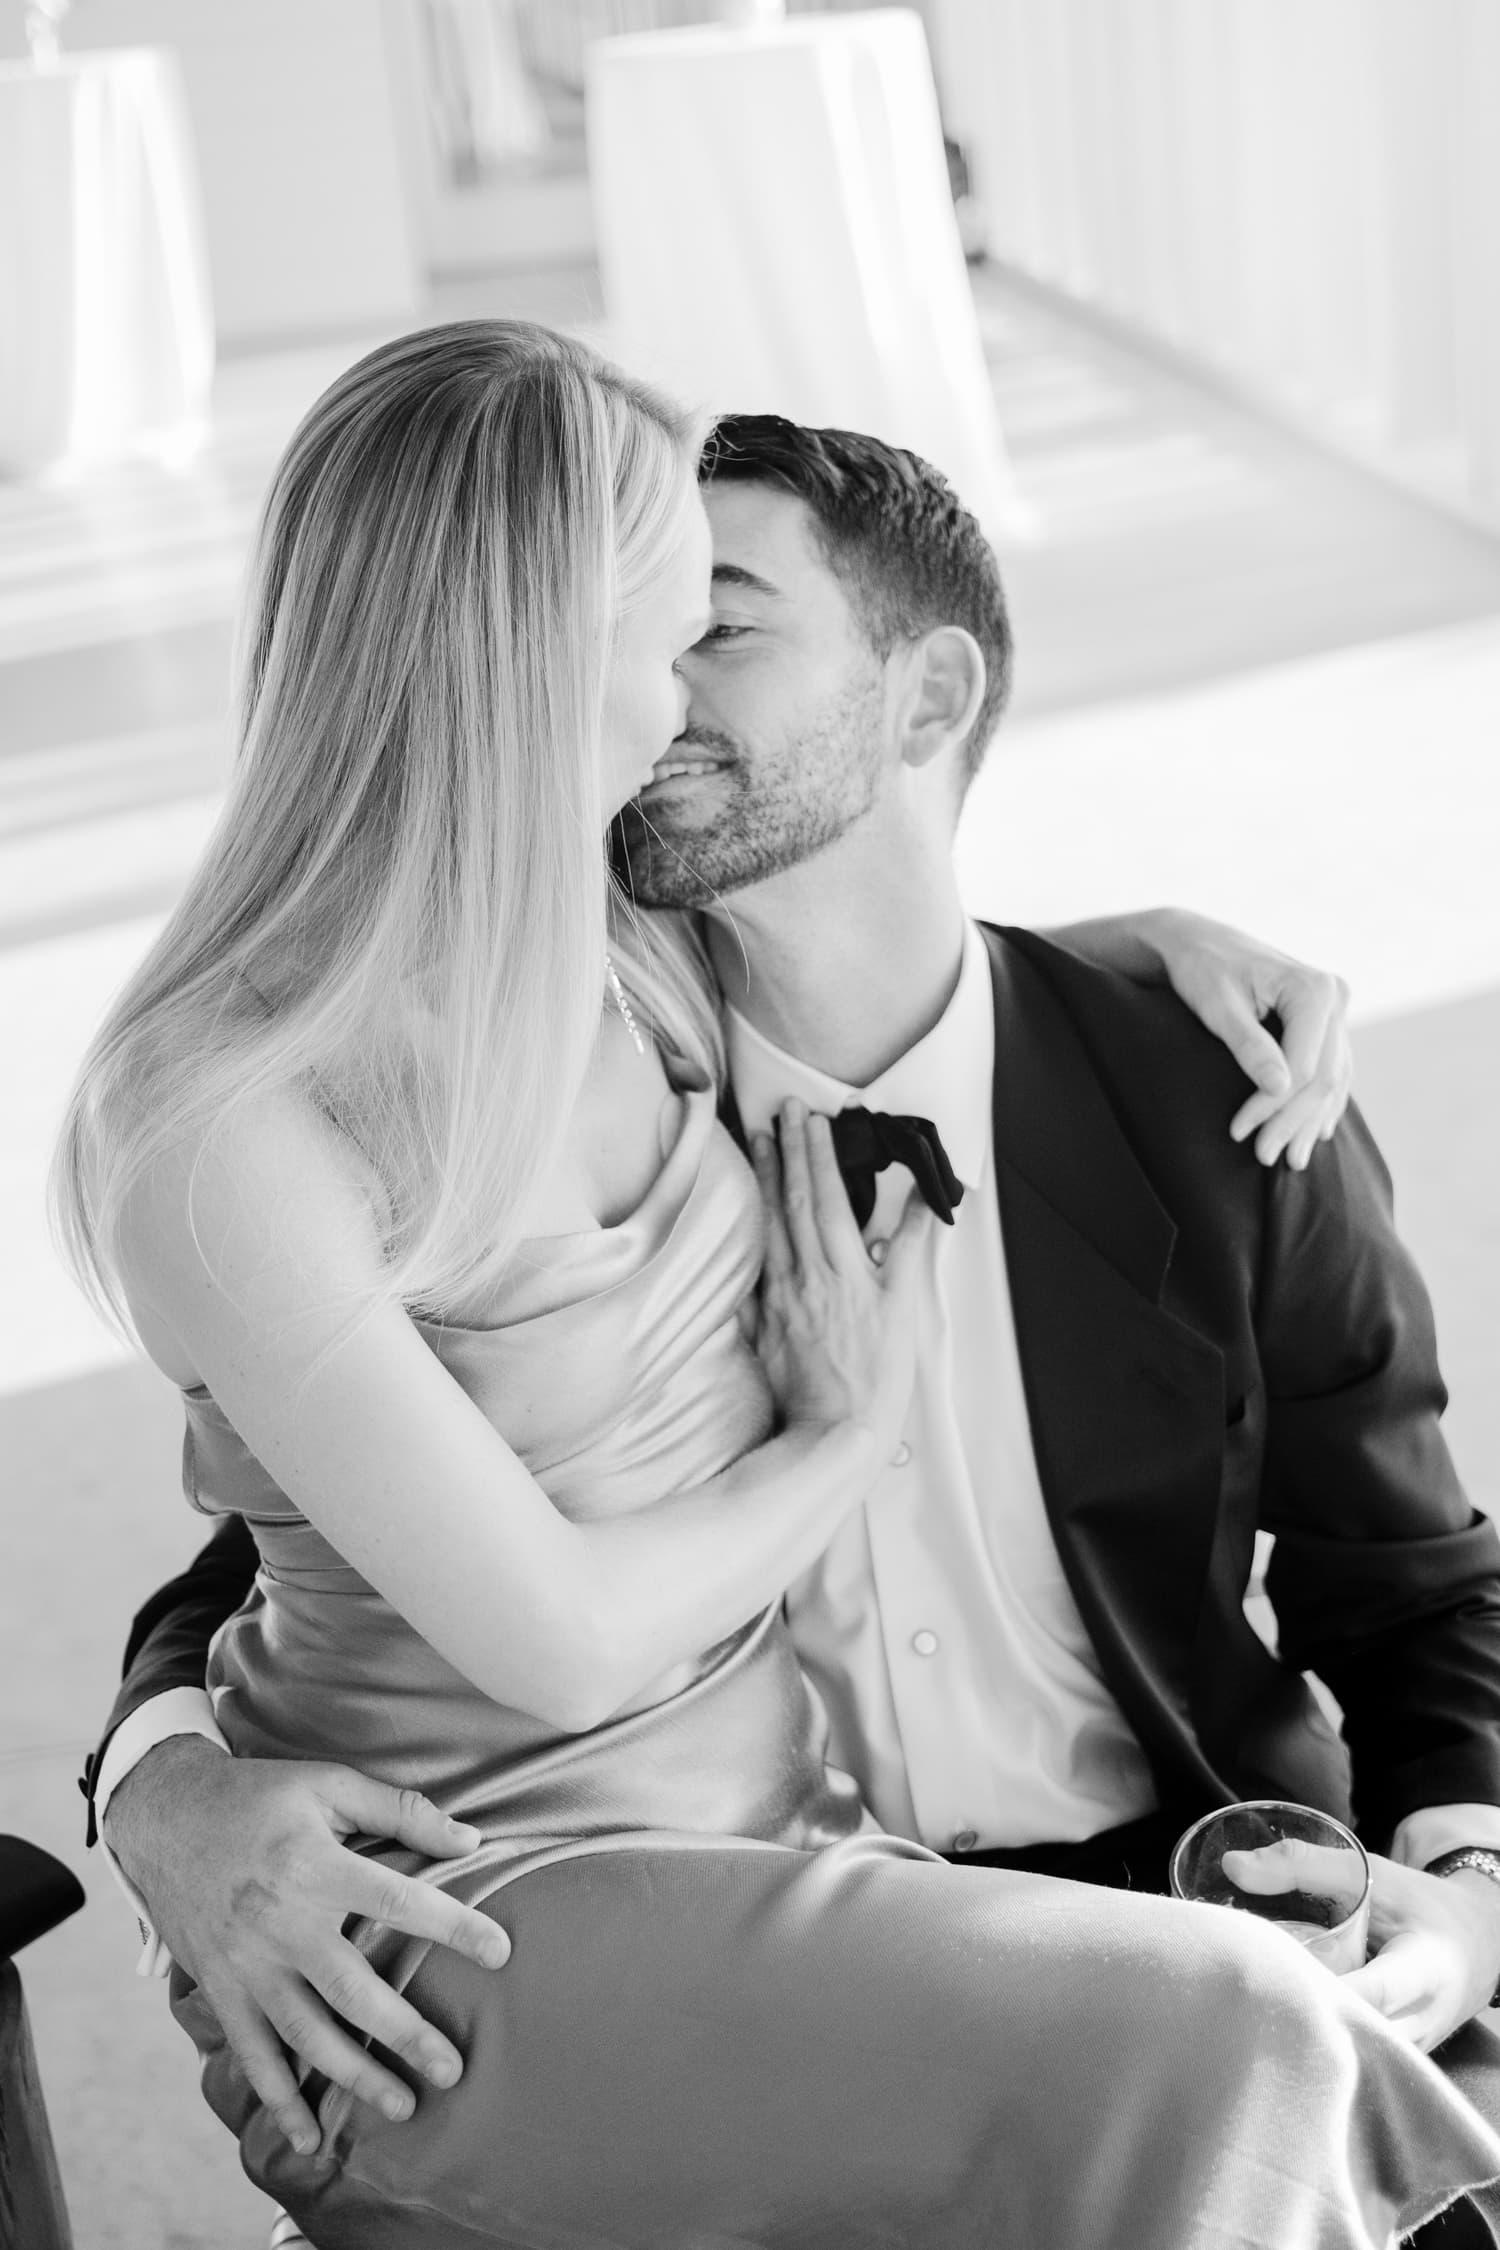 PROSPECT_HOUSE_WEDDING_AUSTIN_TX_MATTHEW_MOORE-00681-2.jpg